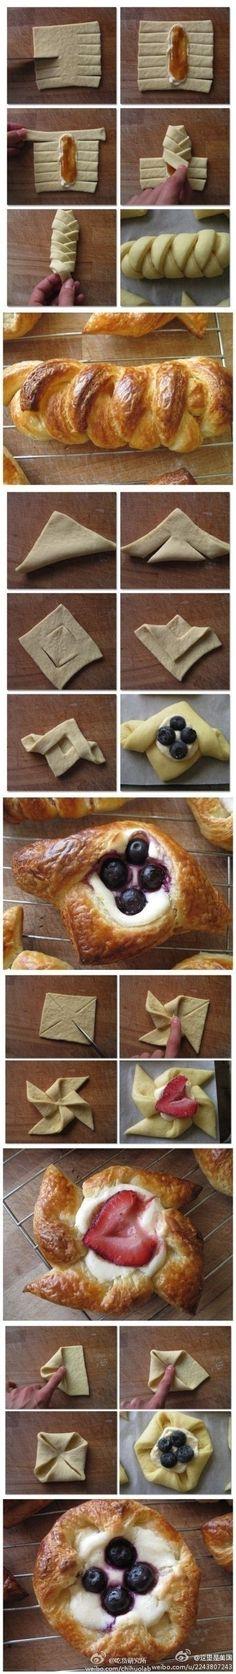 Pastry Folding 101 - FacePalm.com